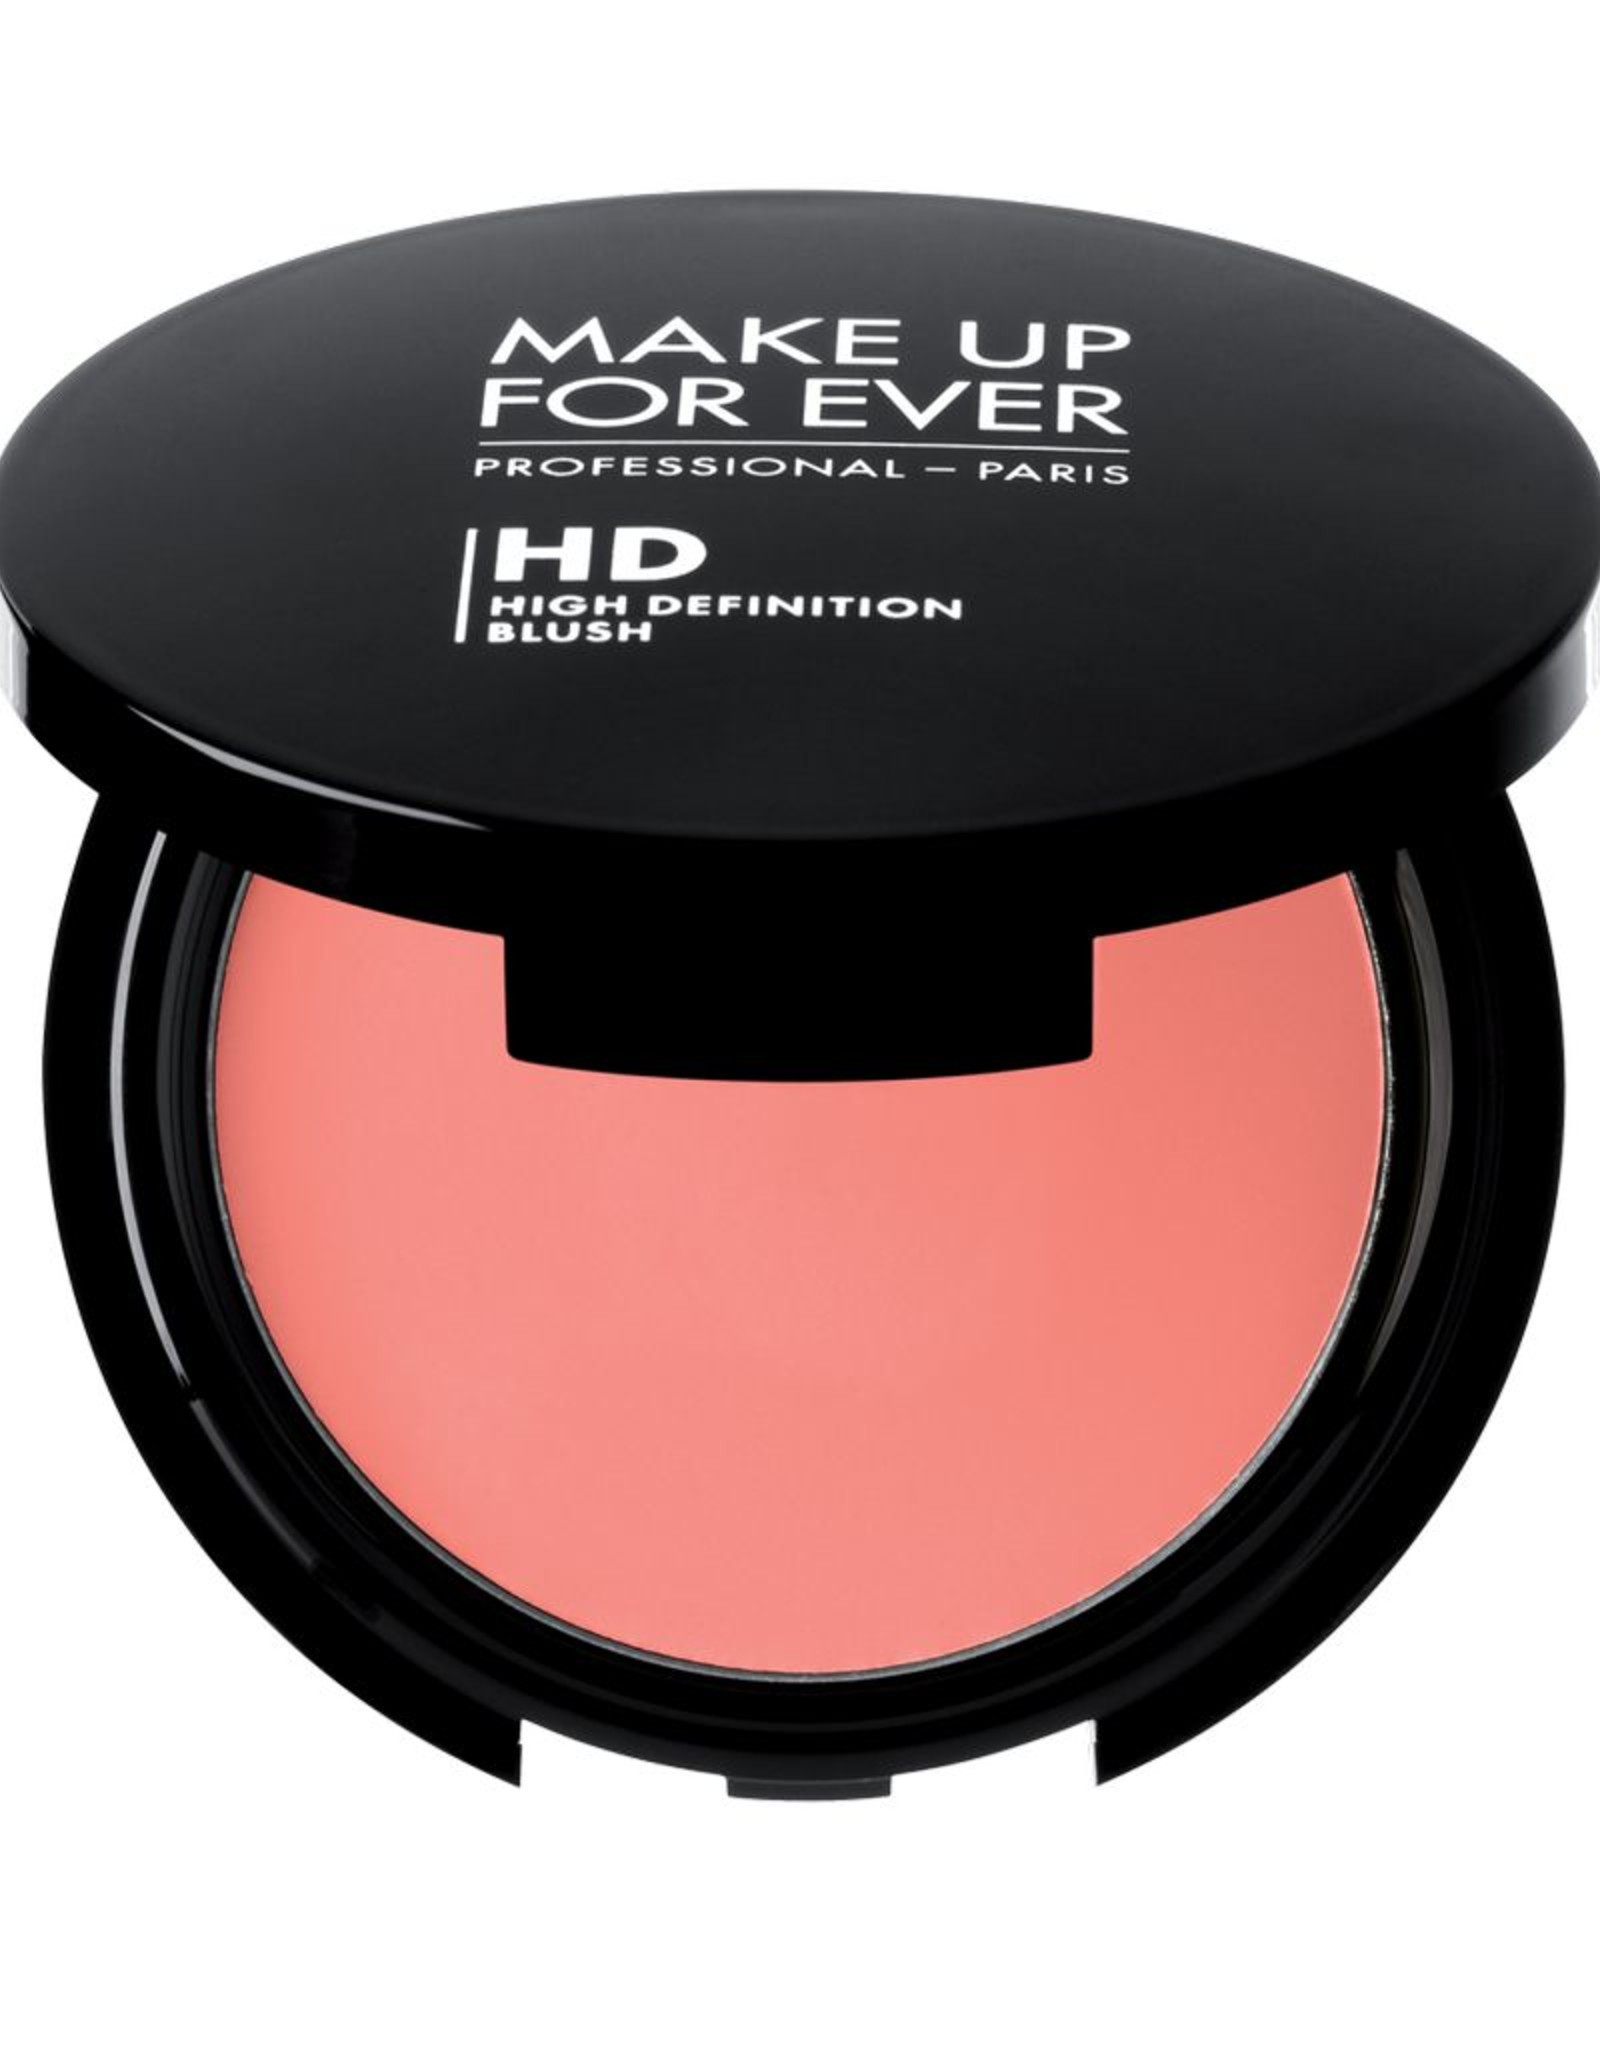 MUFE HD BLUSH CREME 2.8G #215: Flamingo Pink